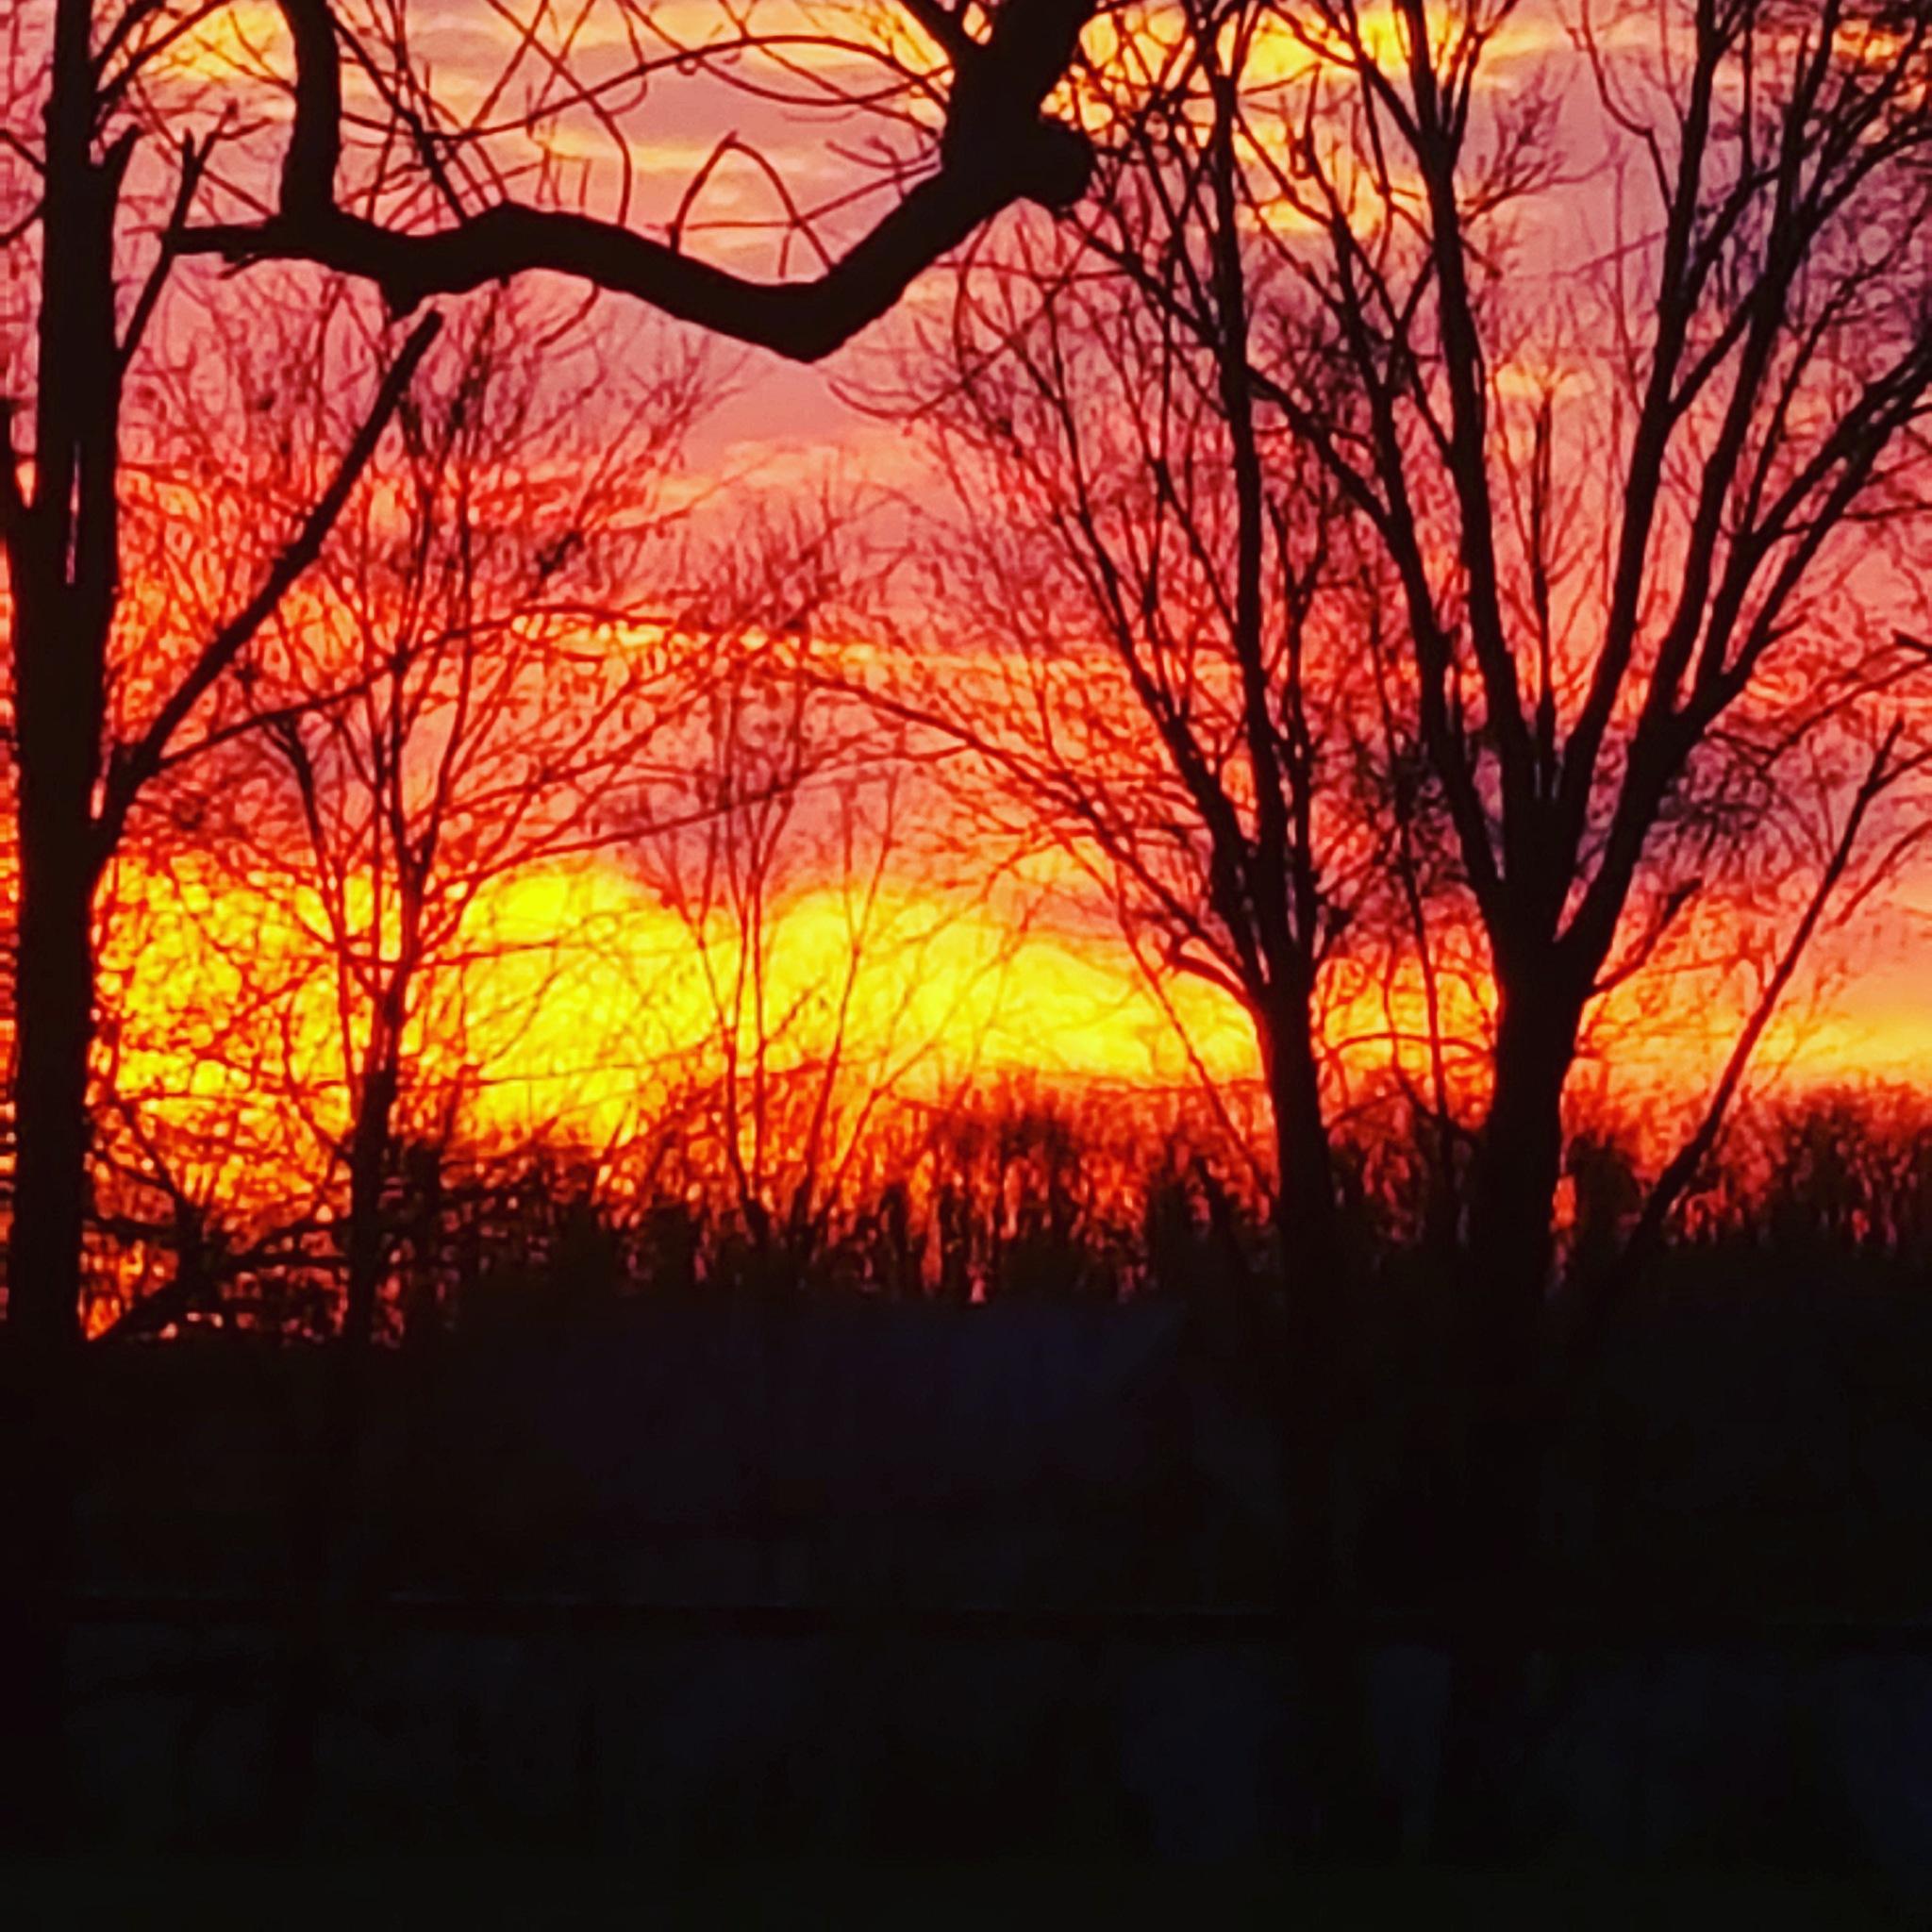 sunrise  by Becky Tinnin